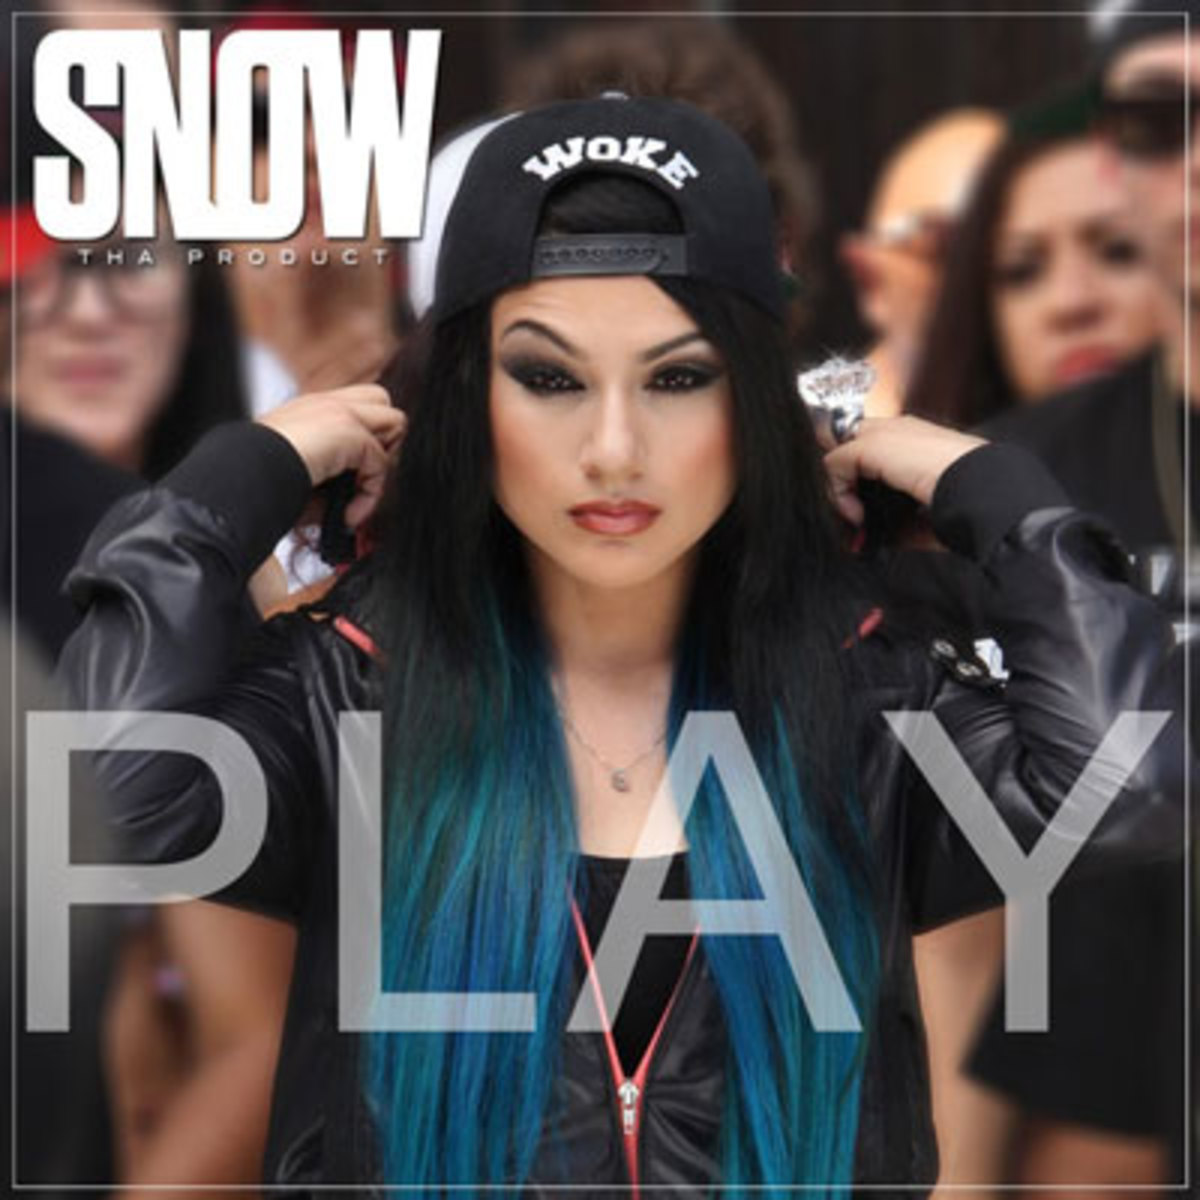 snowtheproduct-play.jpg